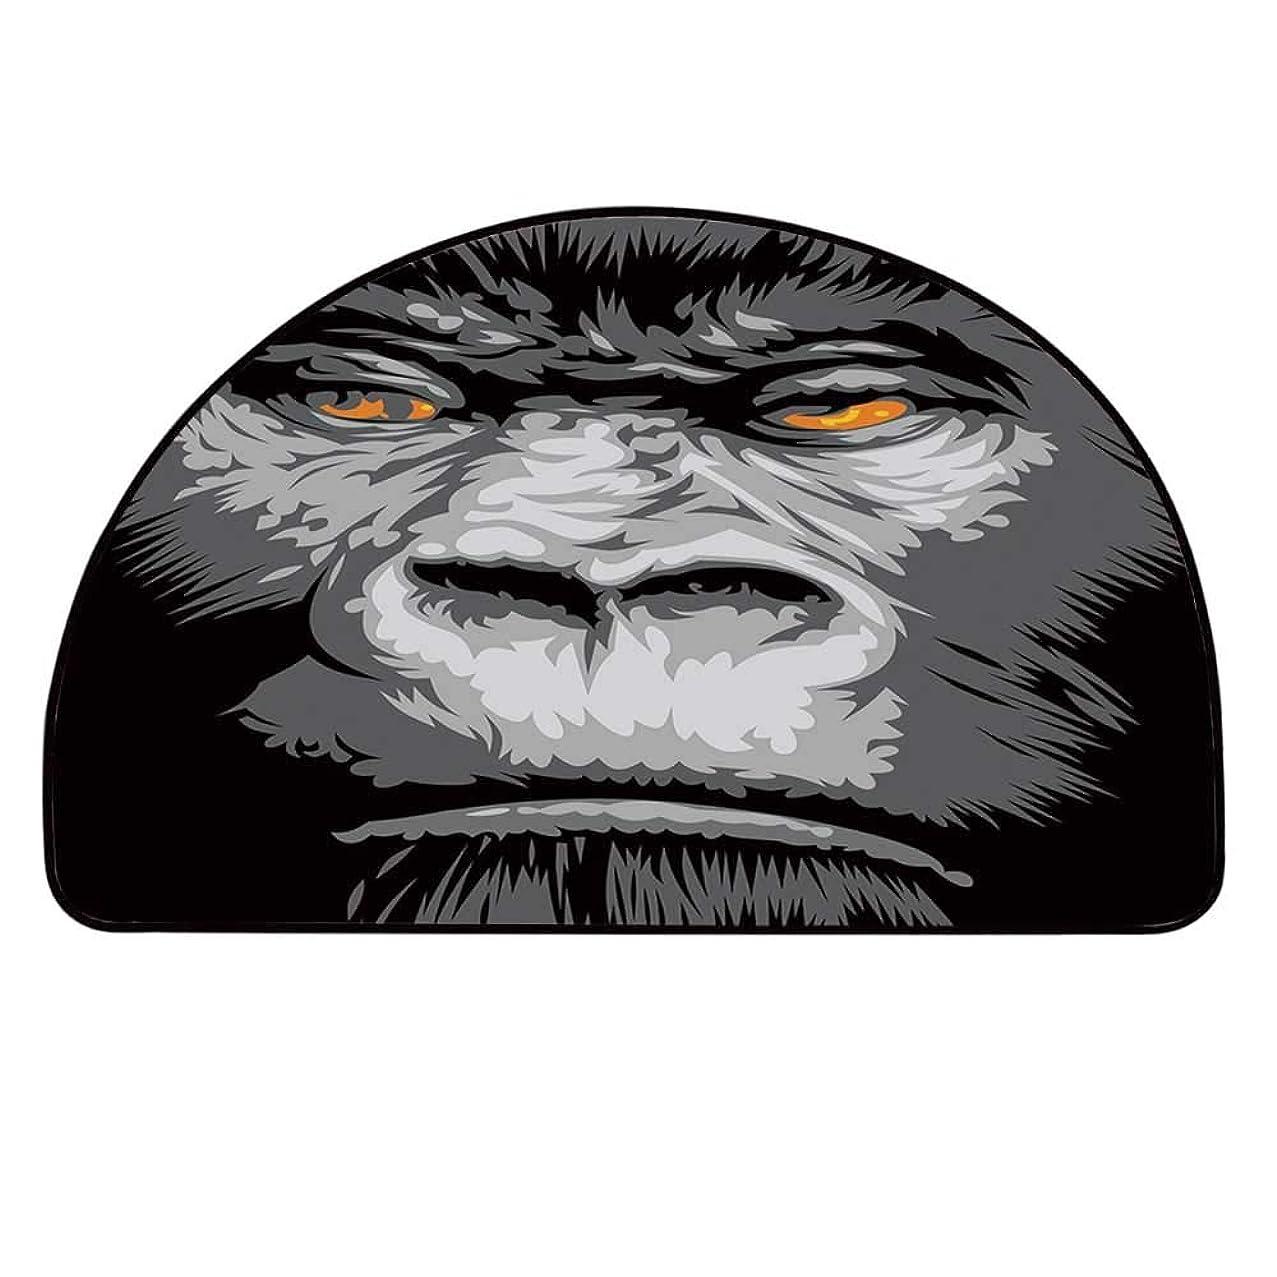 YOLIYANA Modern Doormat,Close Up Gorilla Portrait with Orange Eyes Zoo Jungle Animal Wild Money Graphic Entryway Mat,19.6